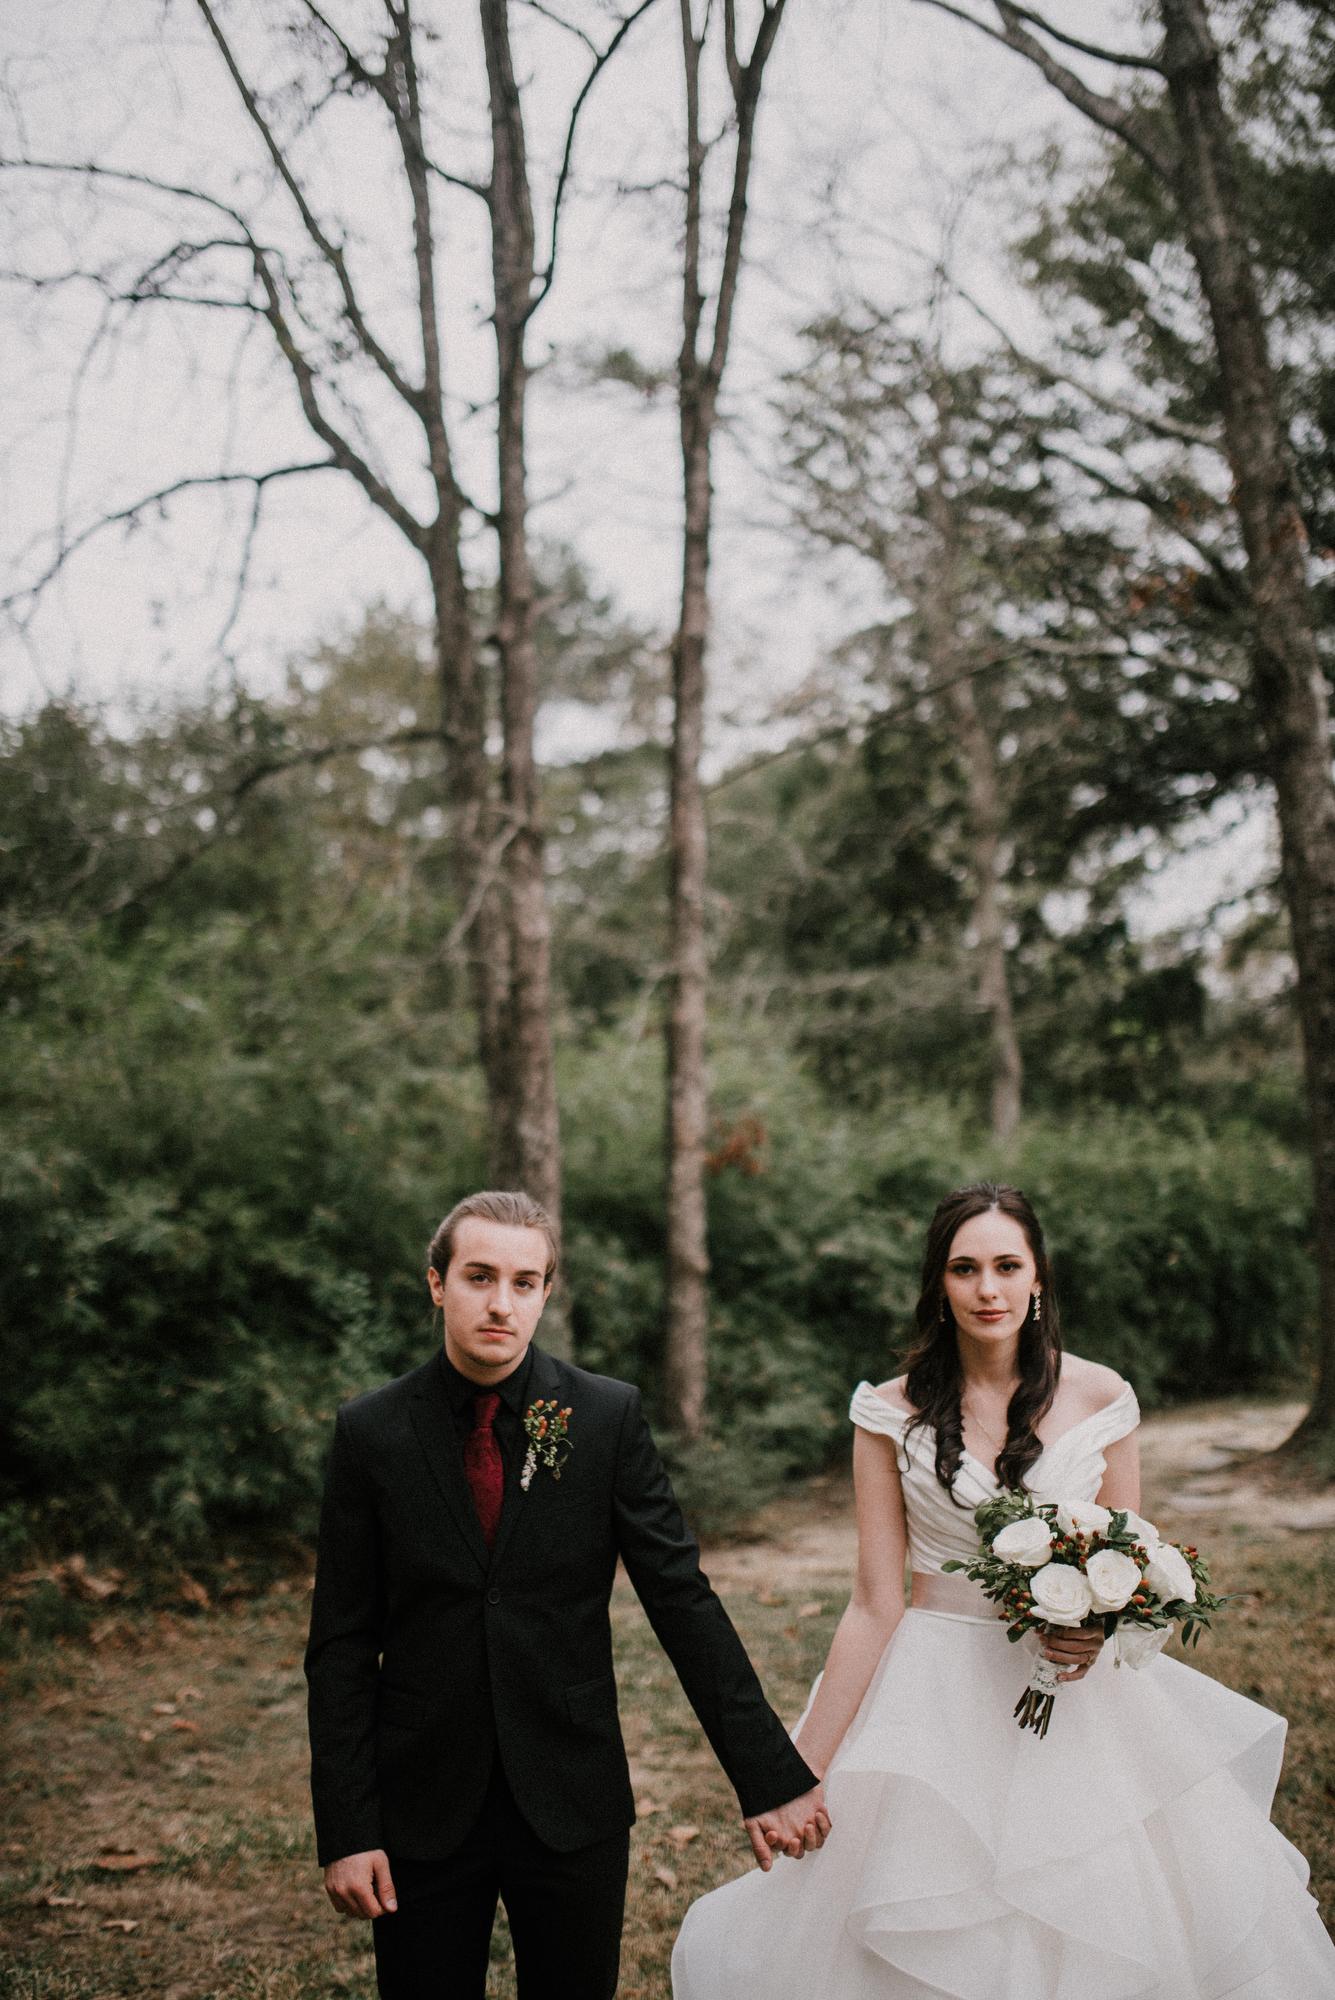 ofRen_weddingPhotos024.JPG